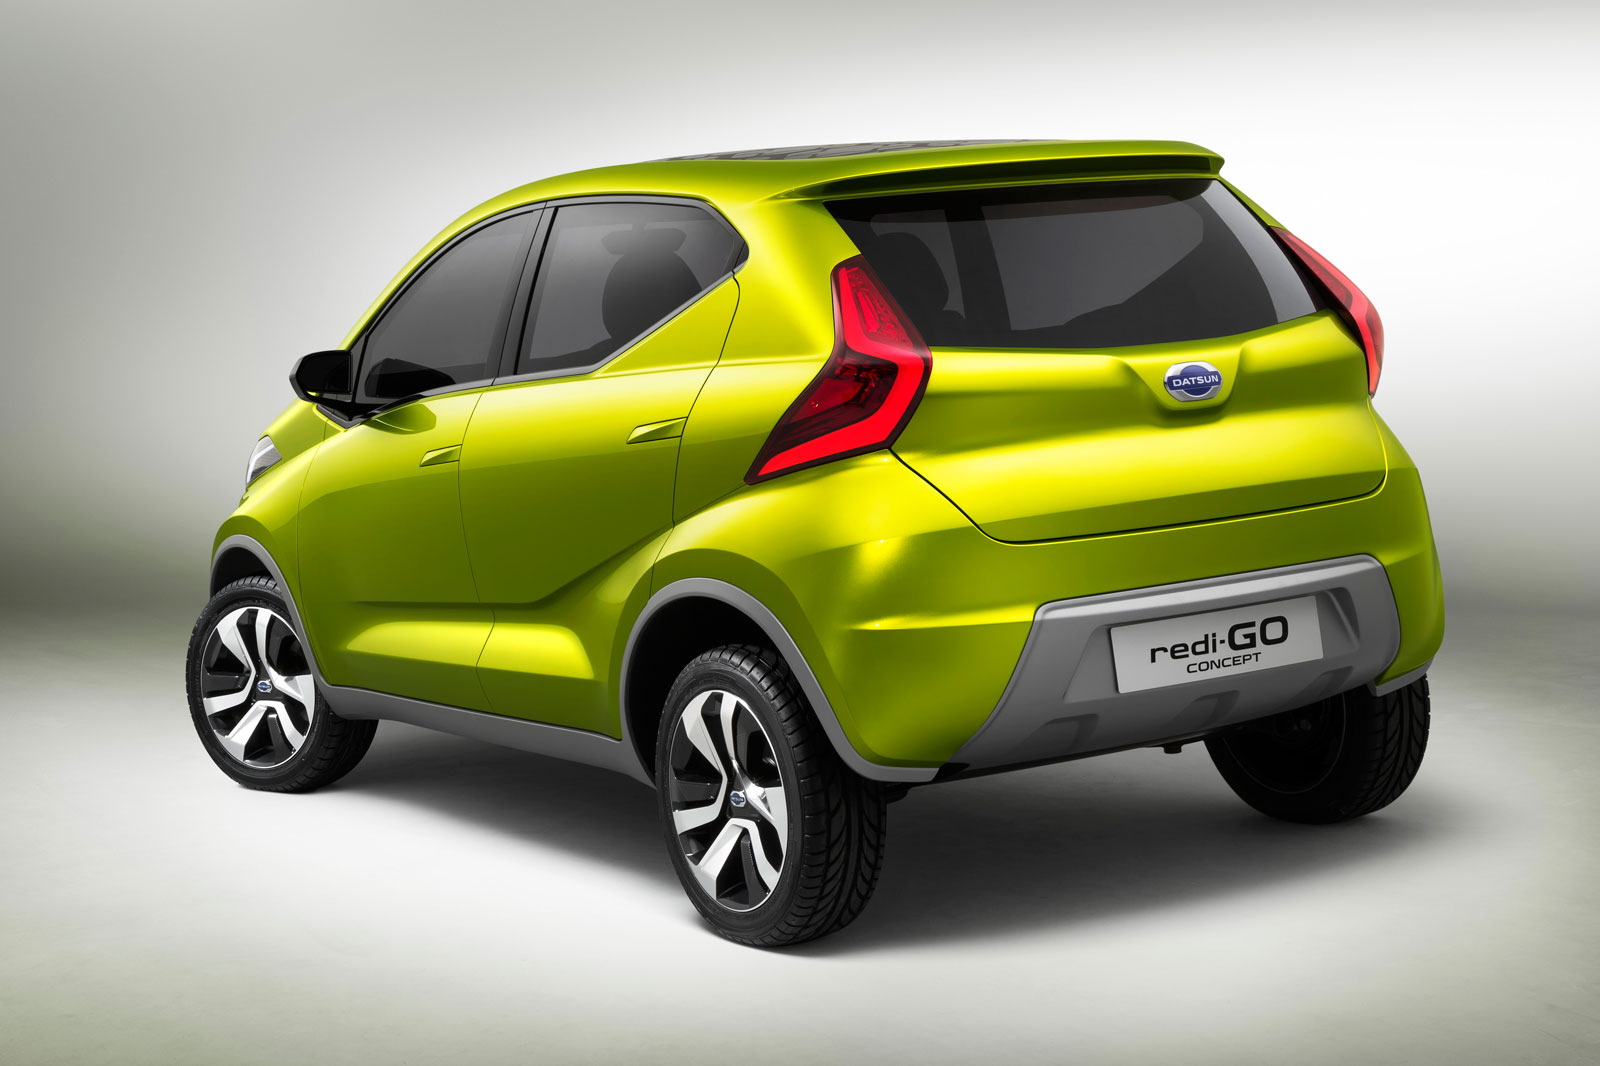 Datsun redi-GO Concept - Car Body Design